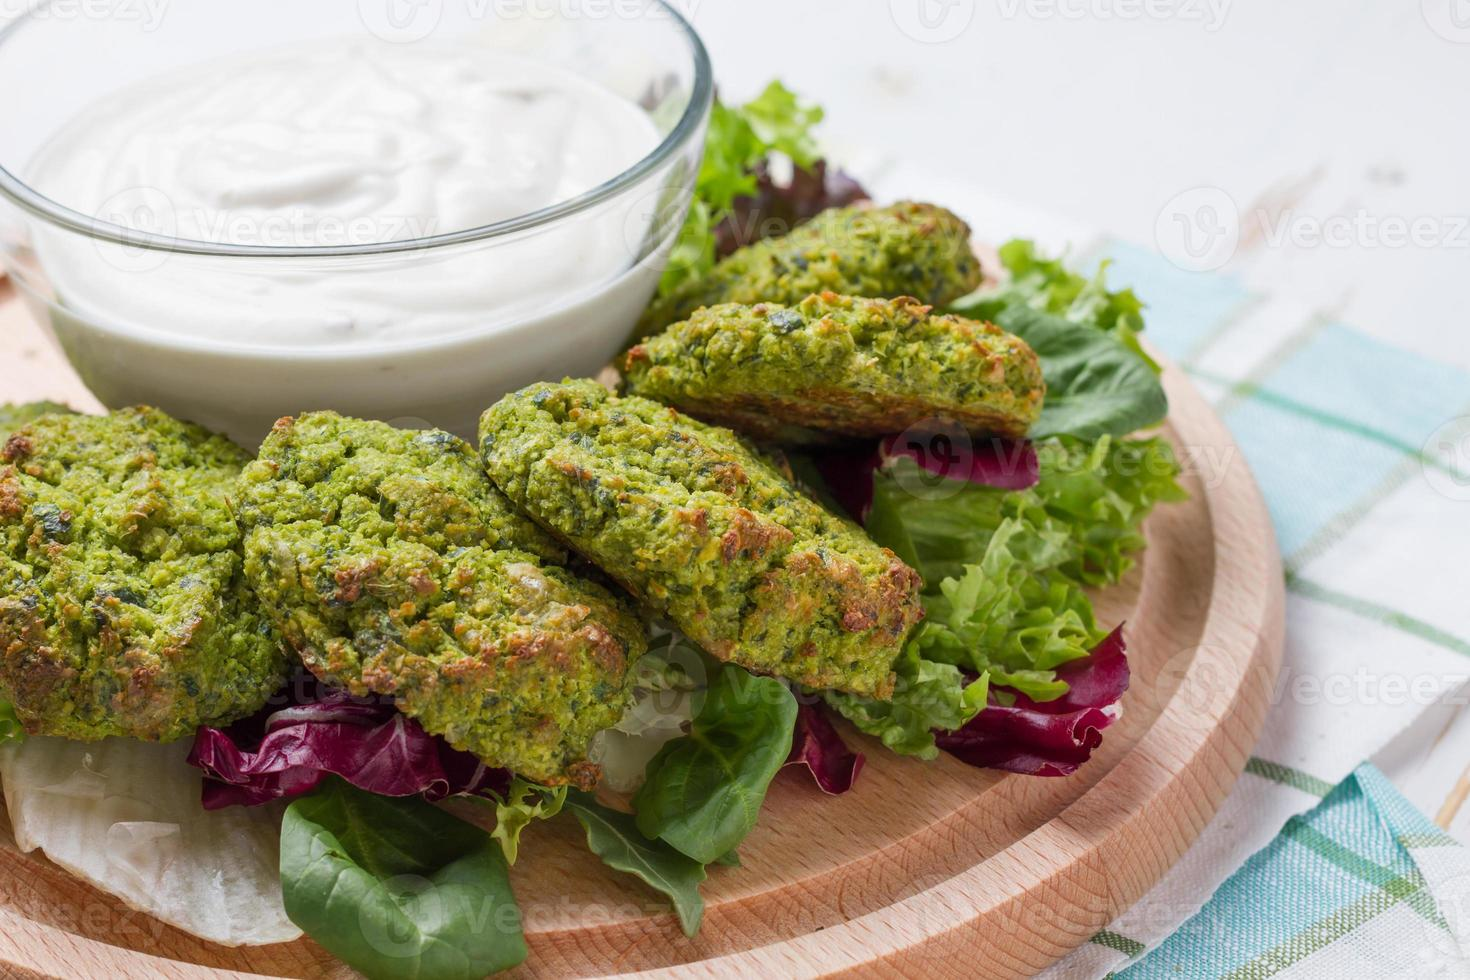 Falafel serviert mit Tahina-Sauce auf Holzbrett foto